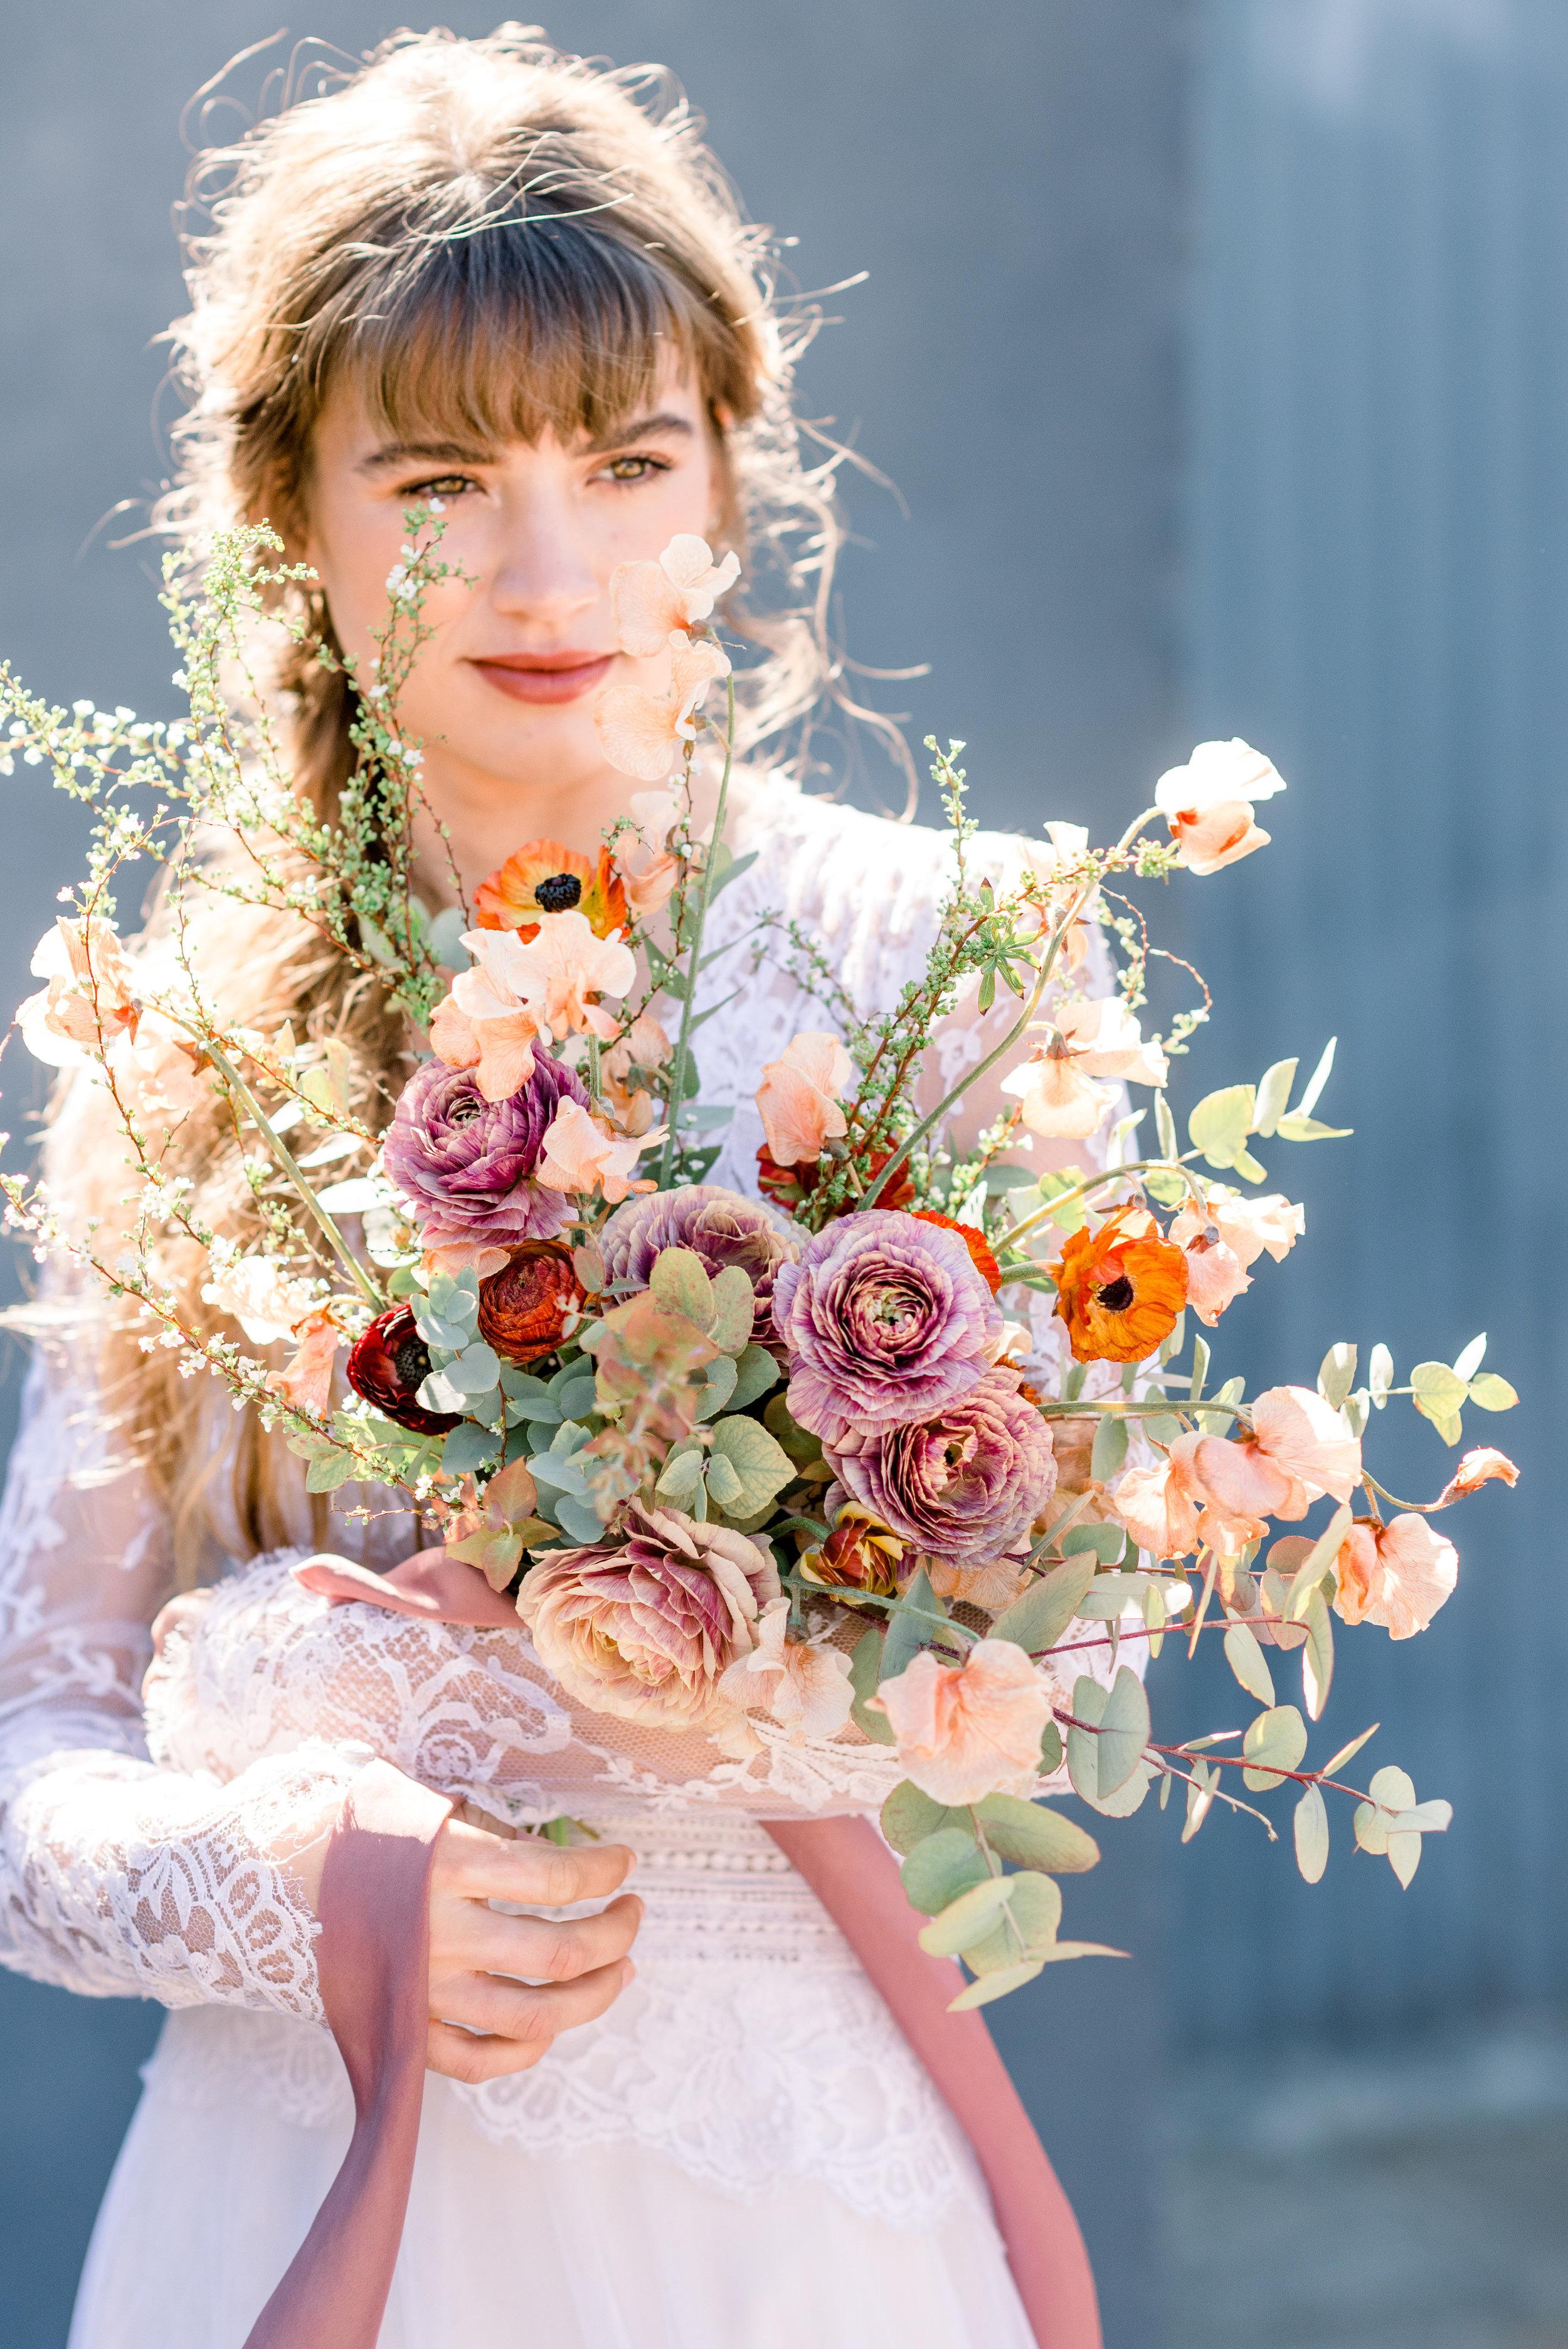 20190224-Pura-Soul-Photo-Siren-Floral-C-22.jpg